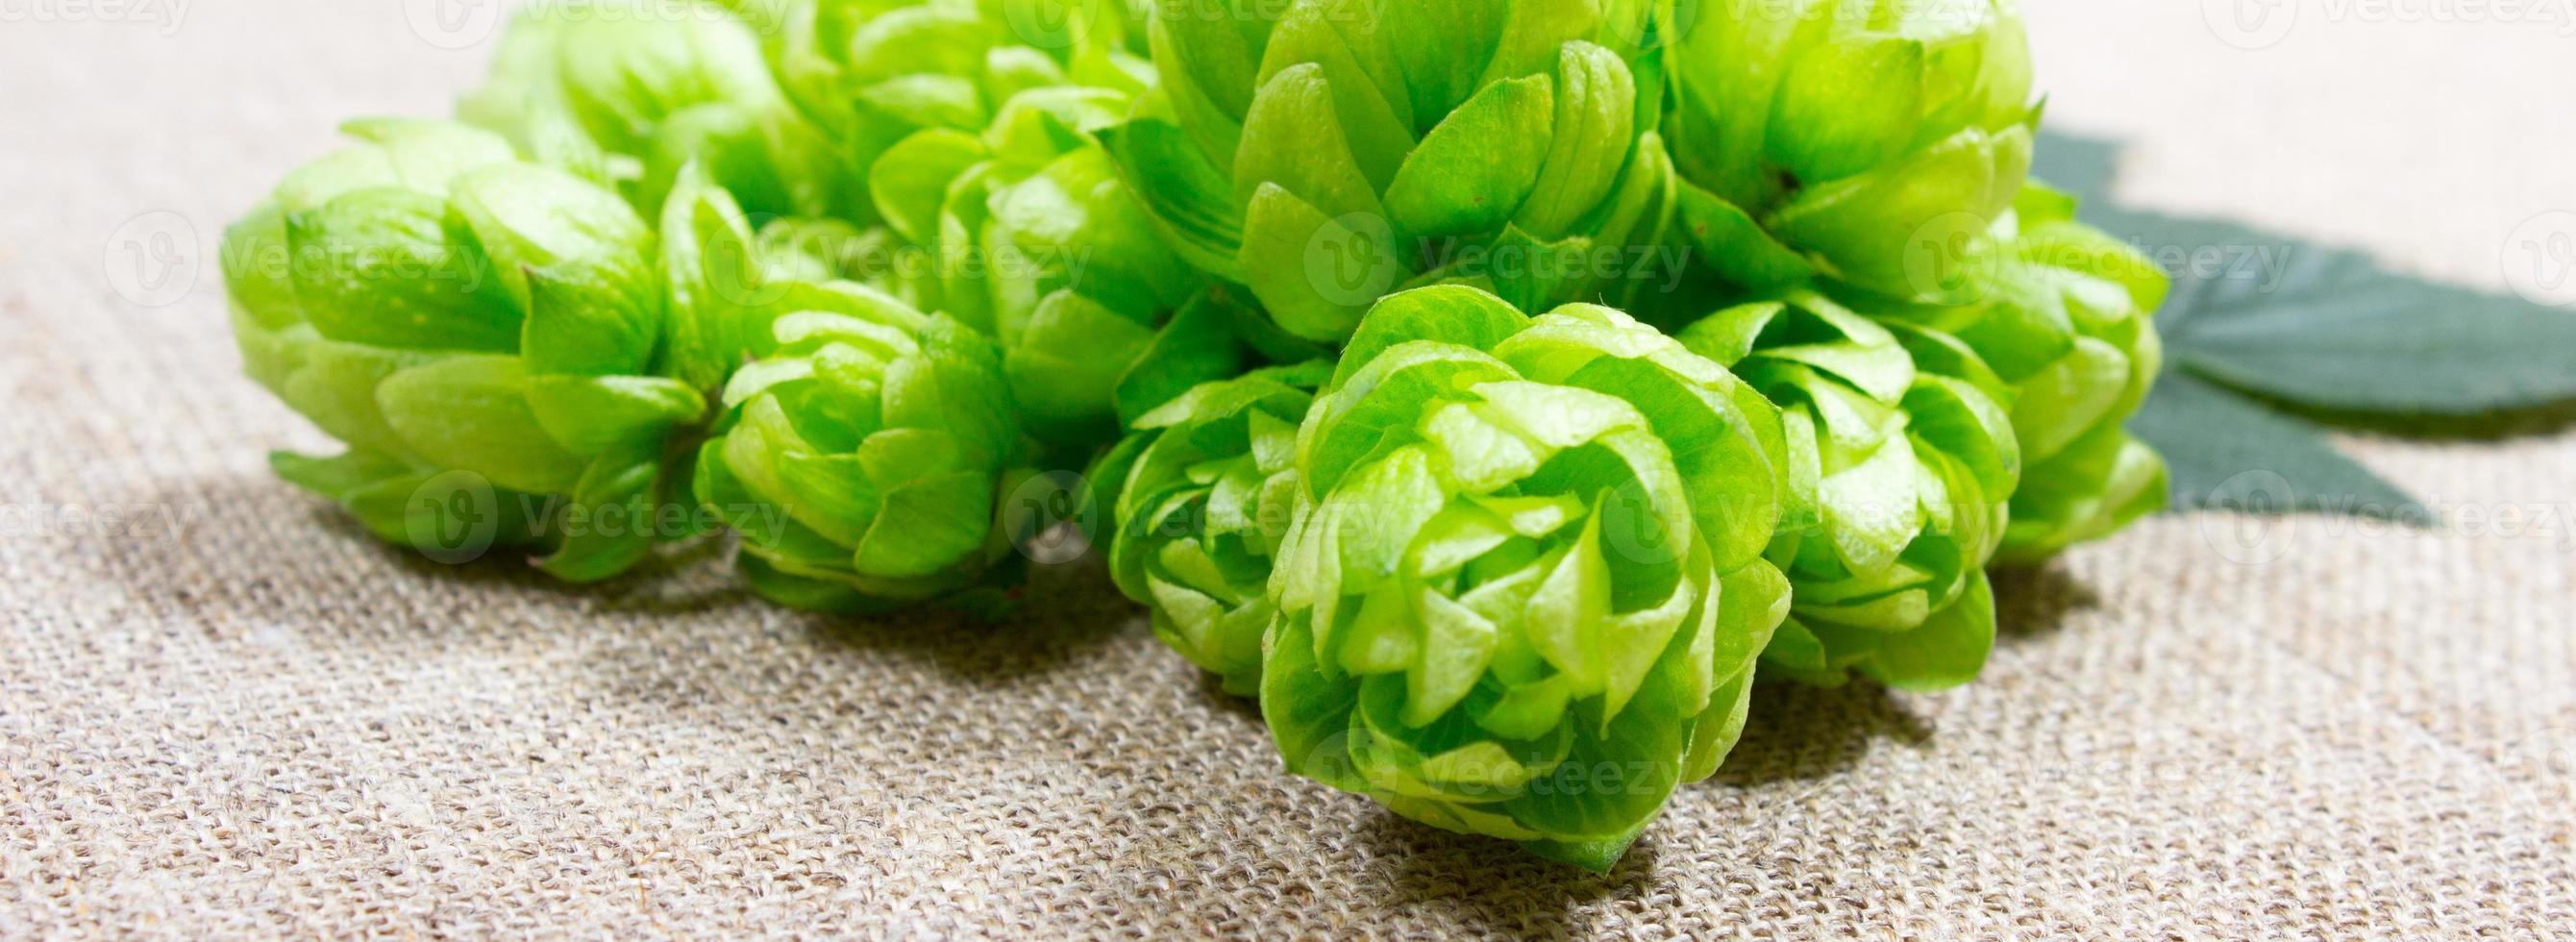 Fresh hops - closeup photo